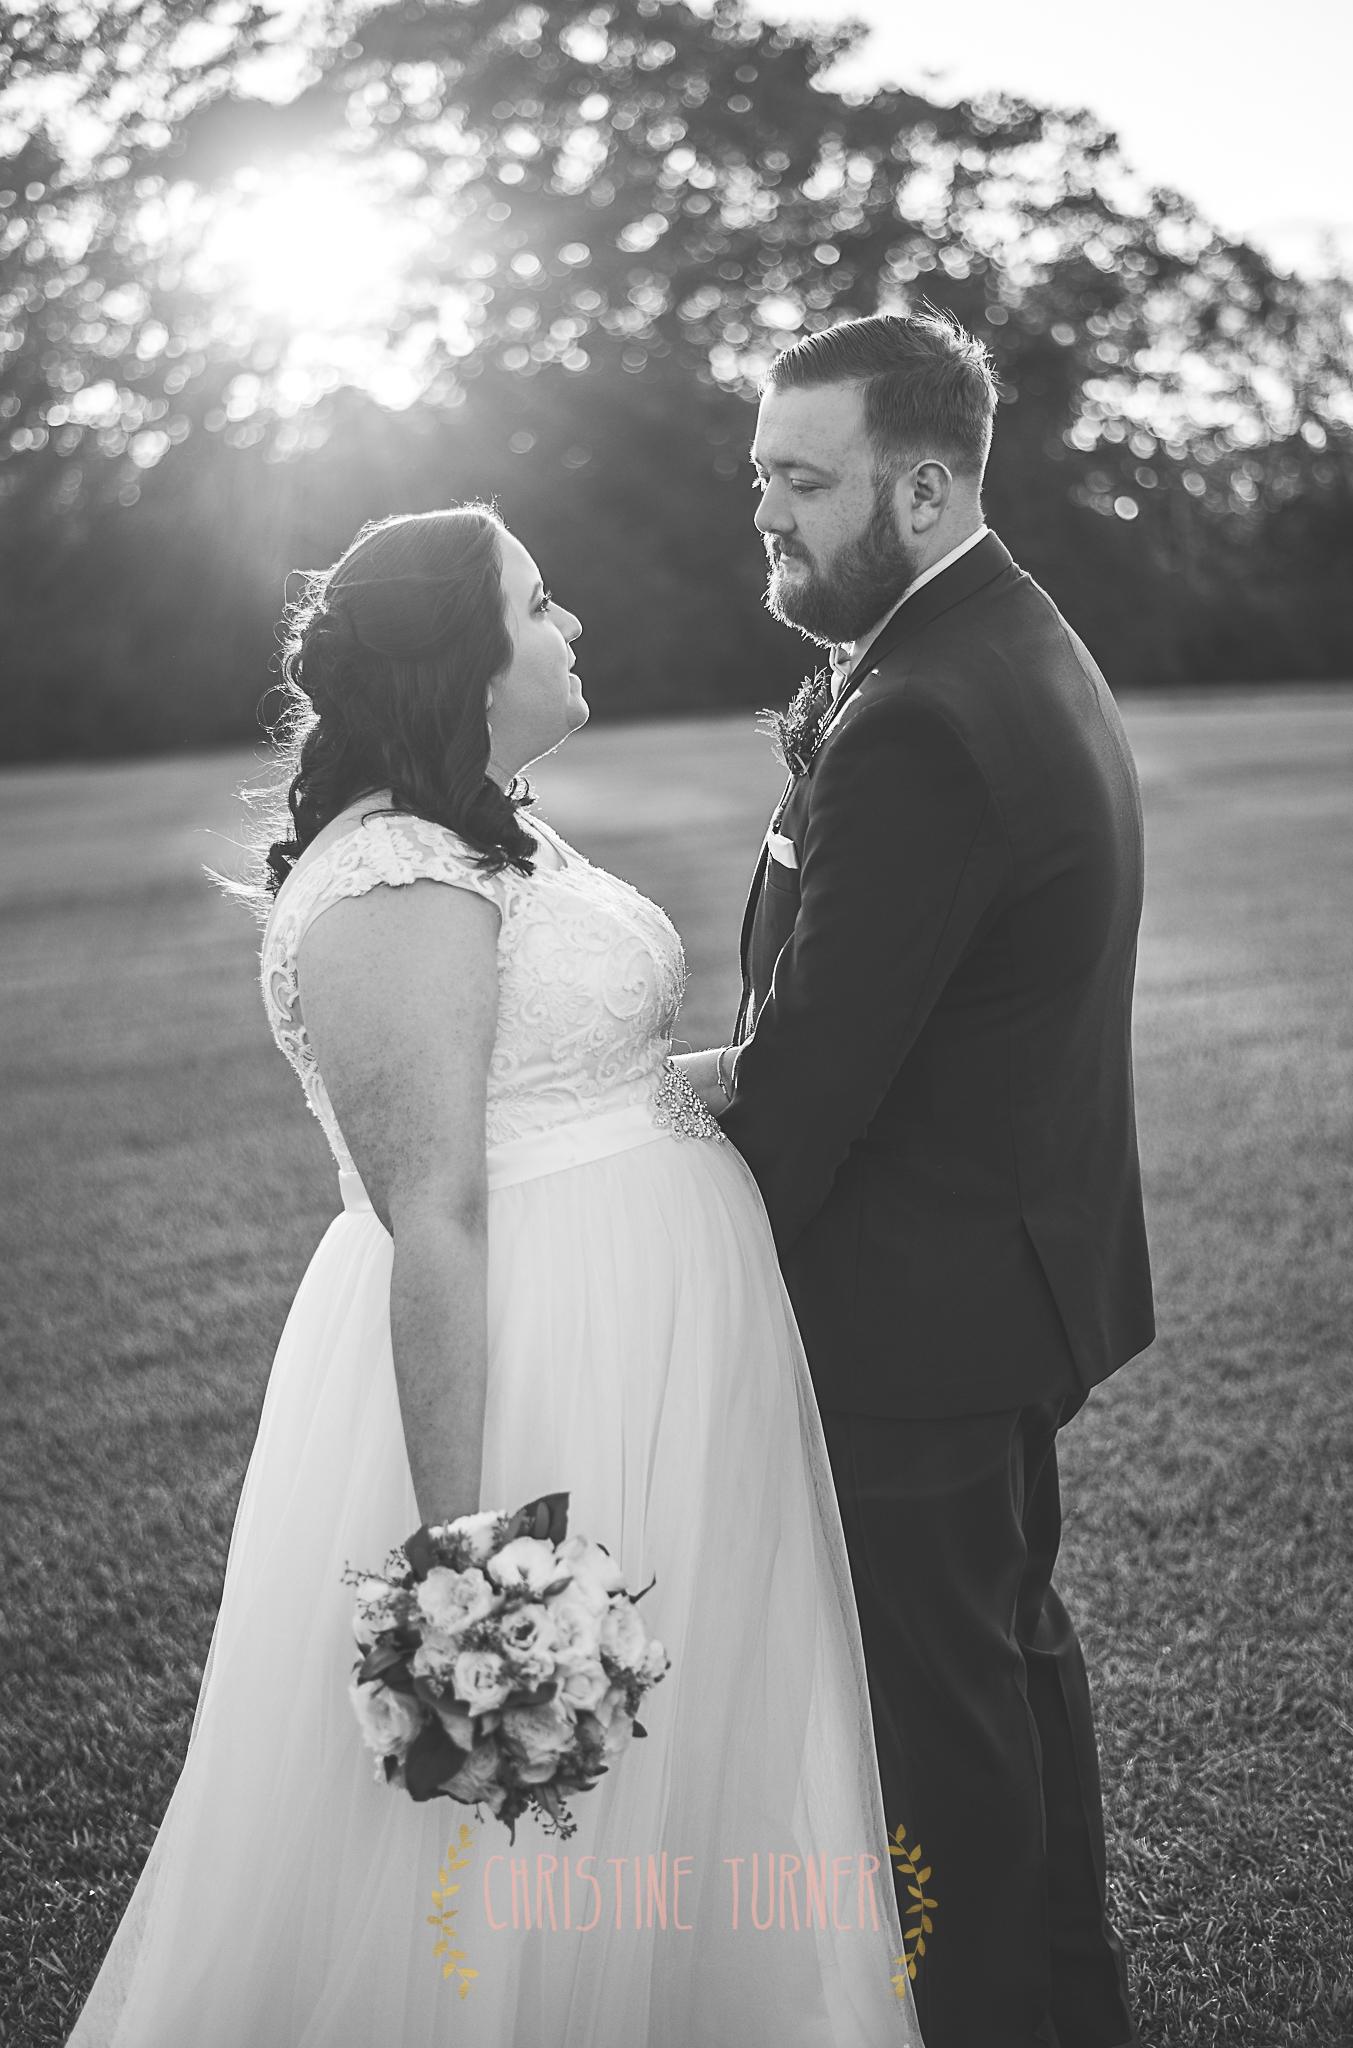 J&D Wedding (12 of 24)